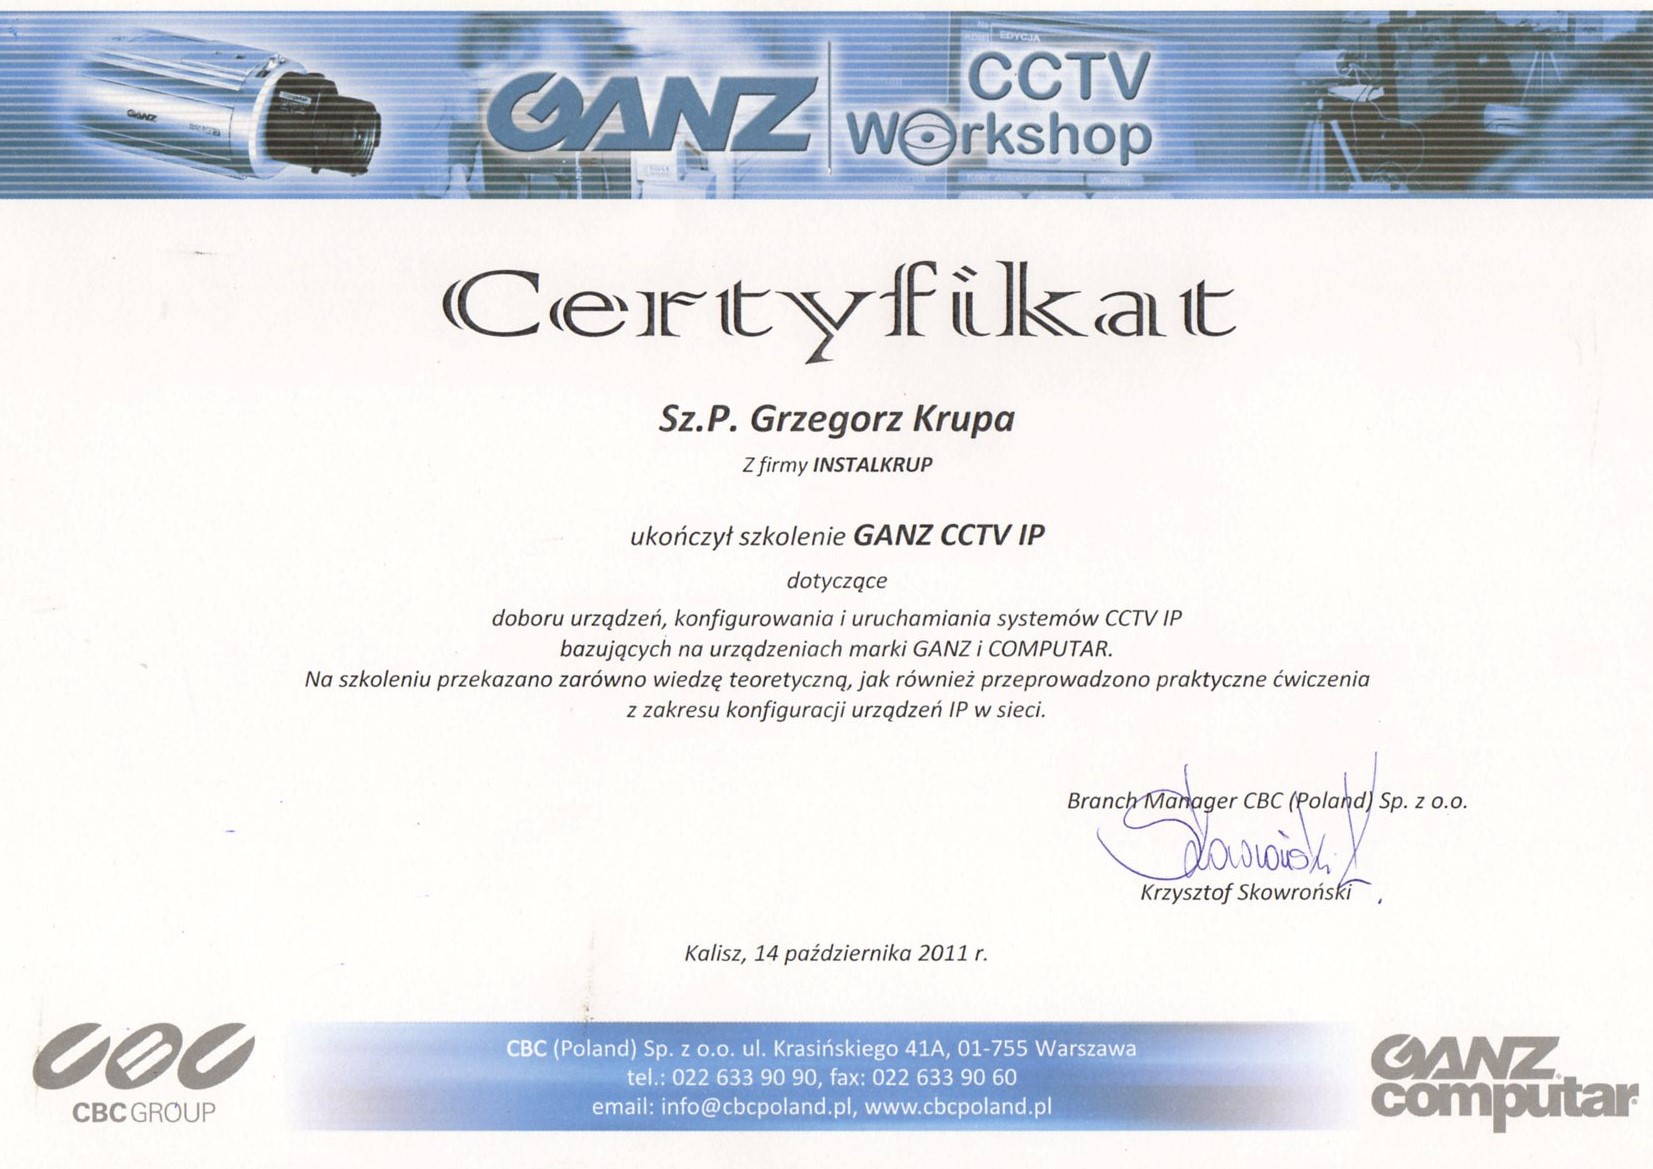 Monitoring GANZ CCTV IP